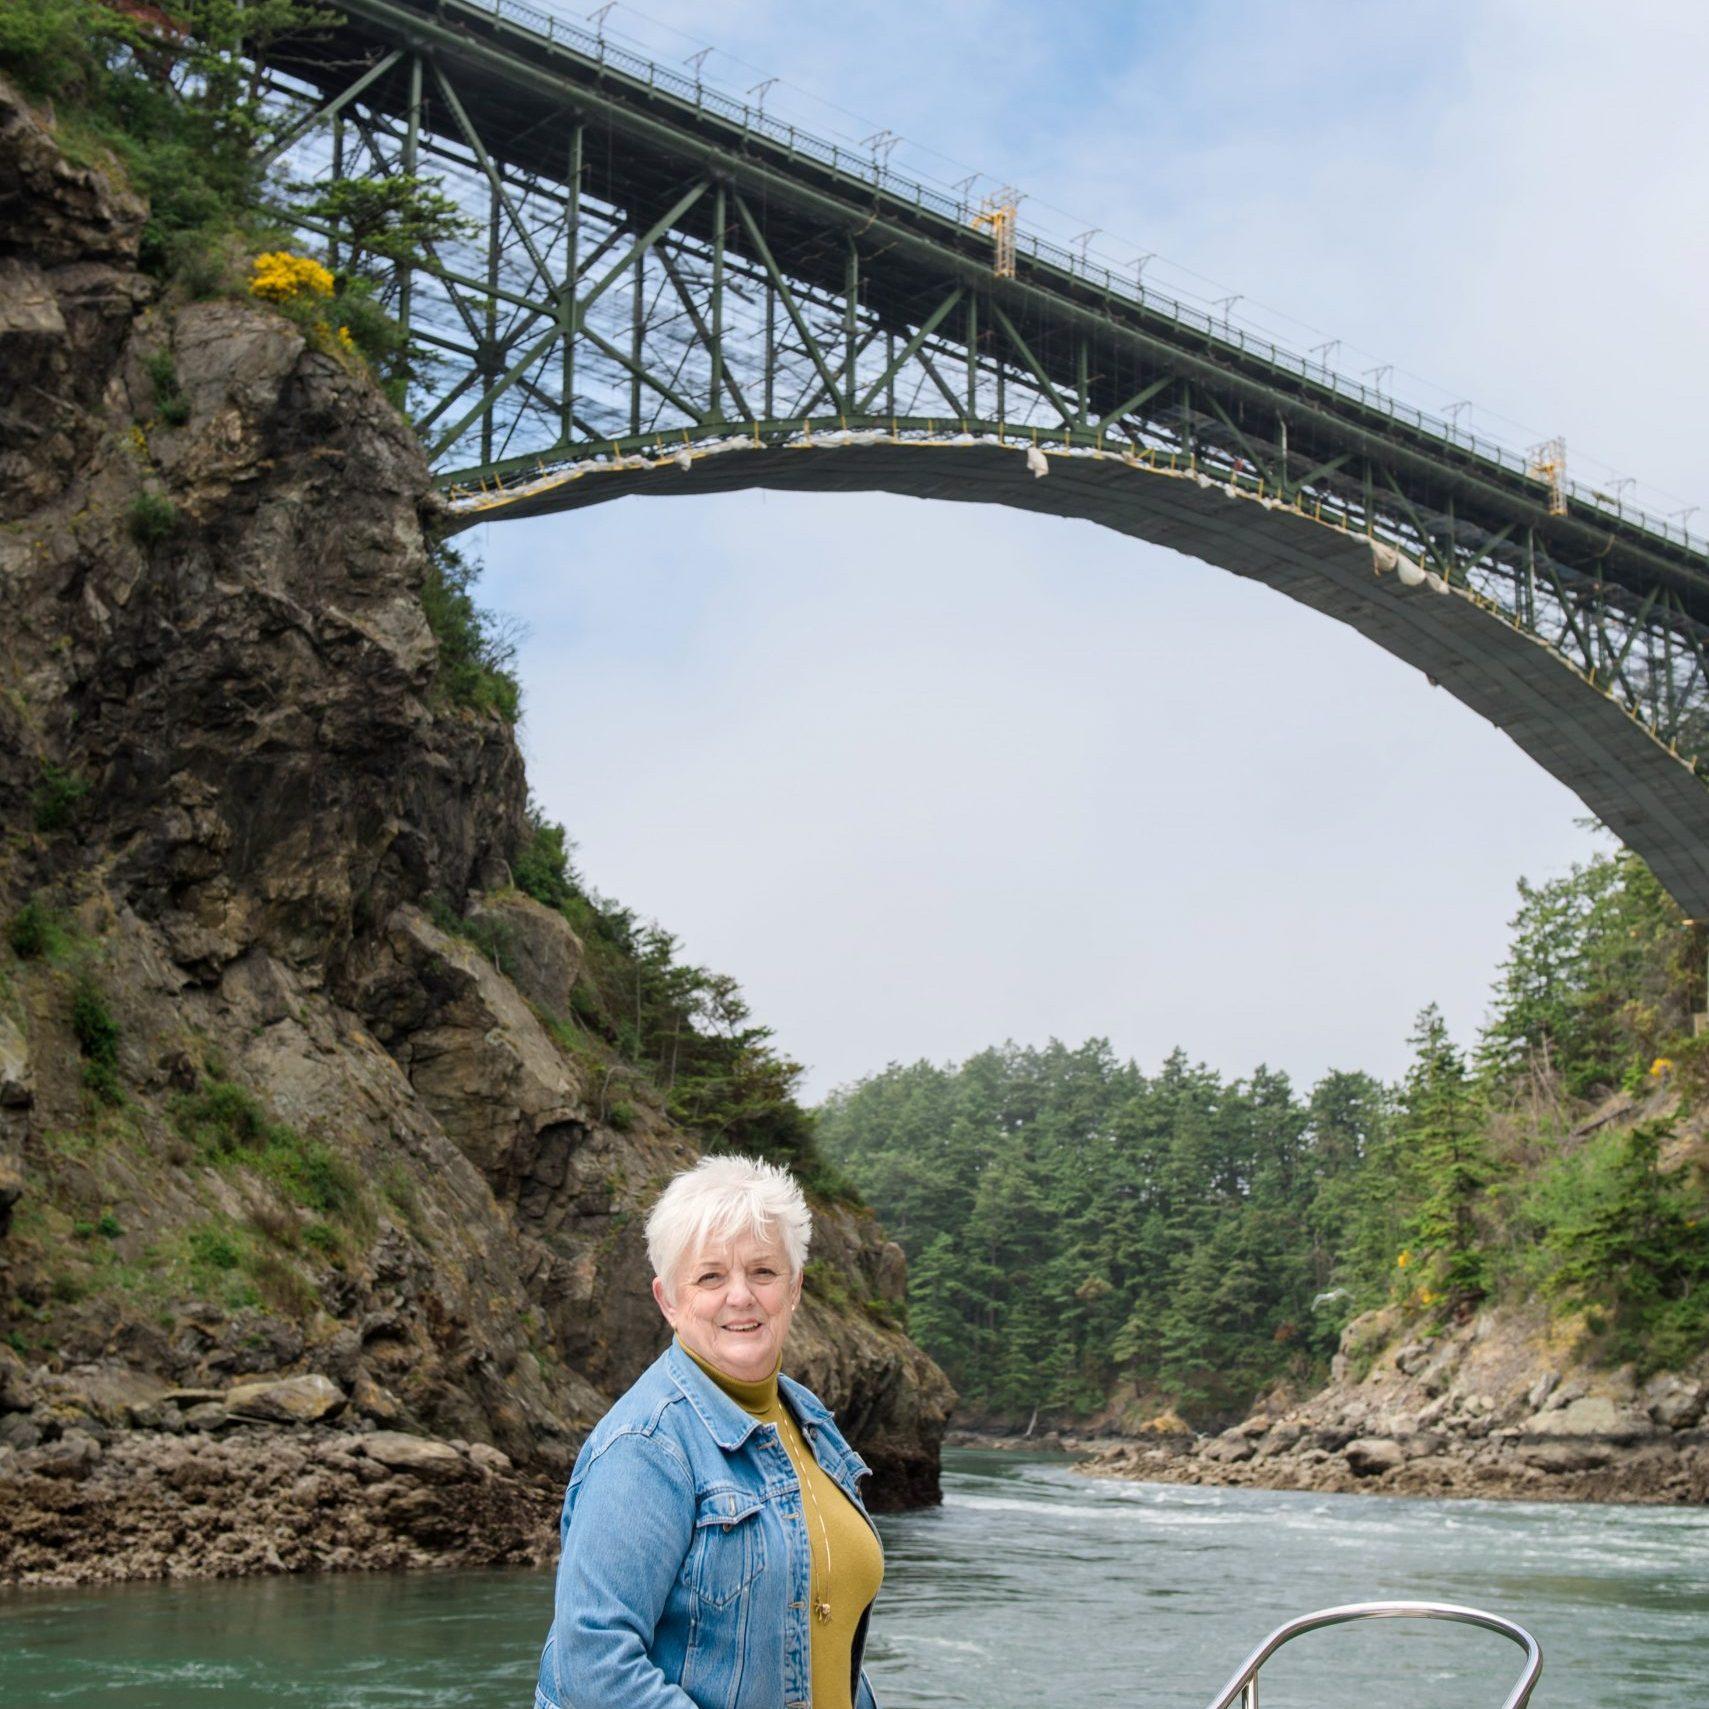 Linda Earnhart, Broker, Windermere Real Estate, Boat, Deception Pass, Whidbey Island, Washington